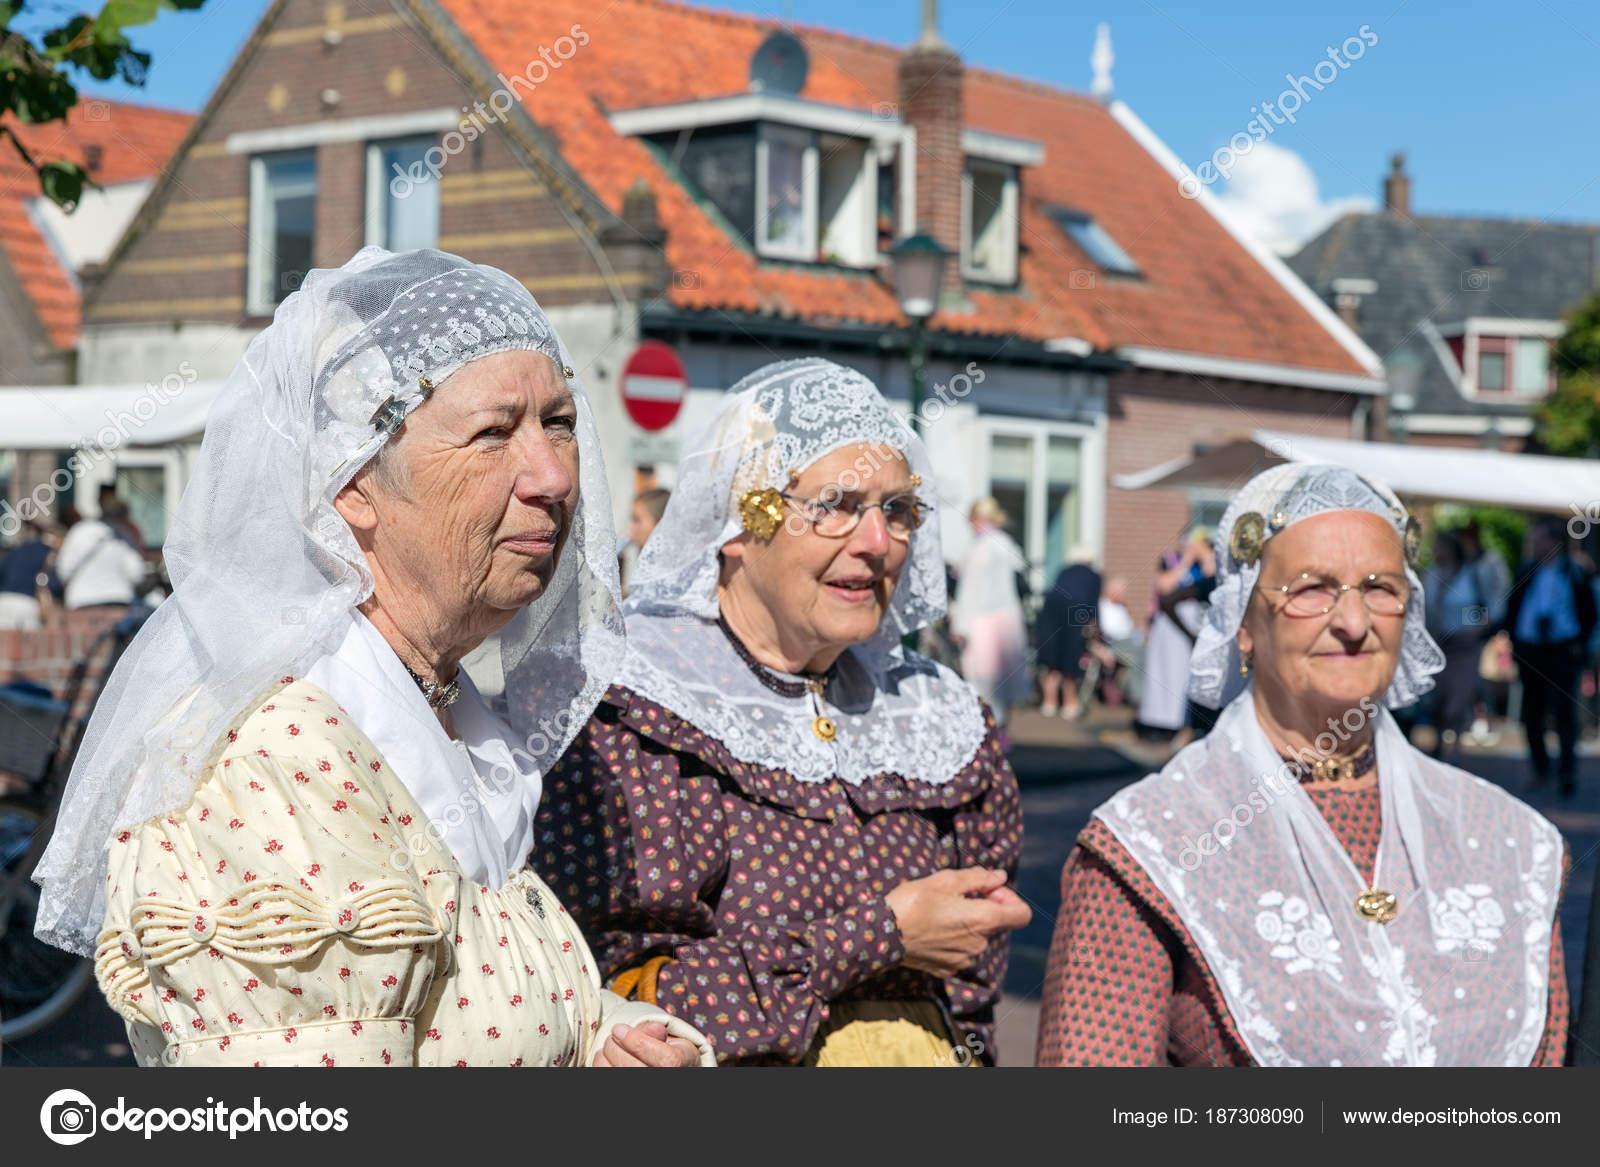 Nederlandse Kleding.Nederlandse Vrouwen Met Traditionele Kleding En Hoofddeksels Op